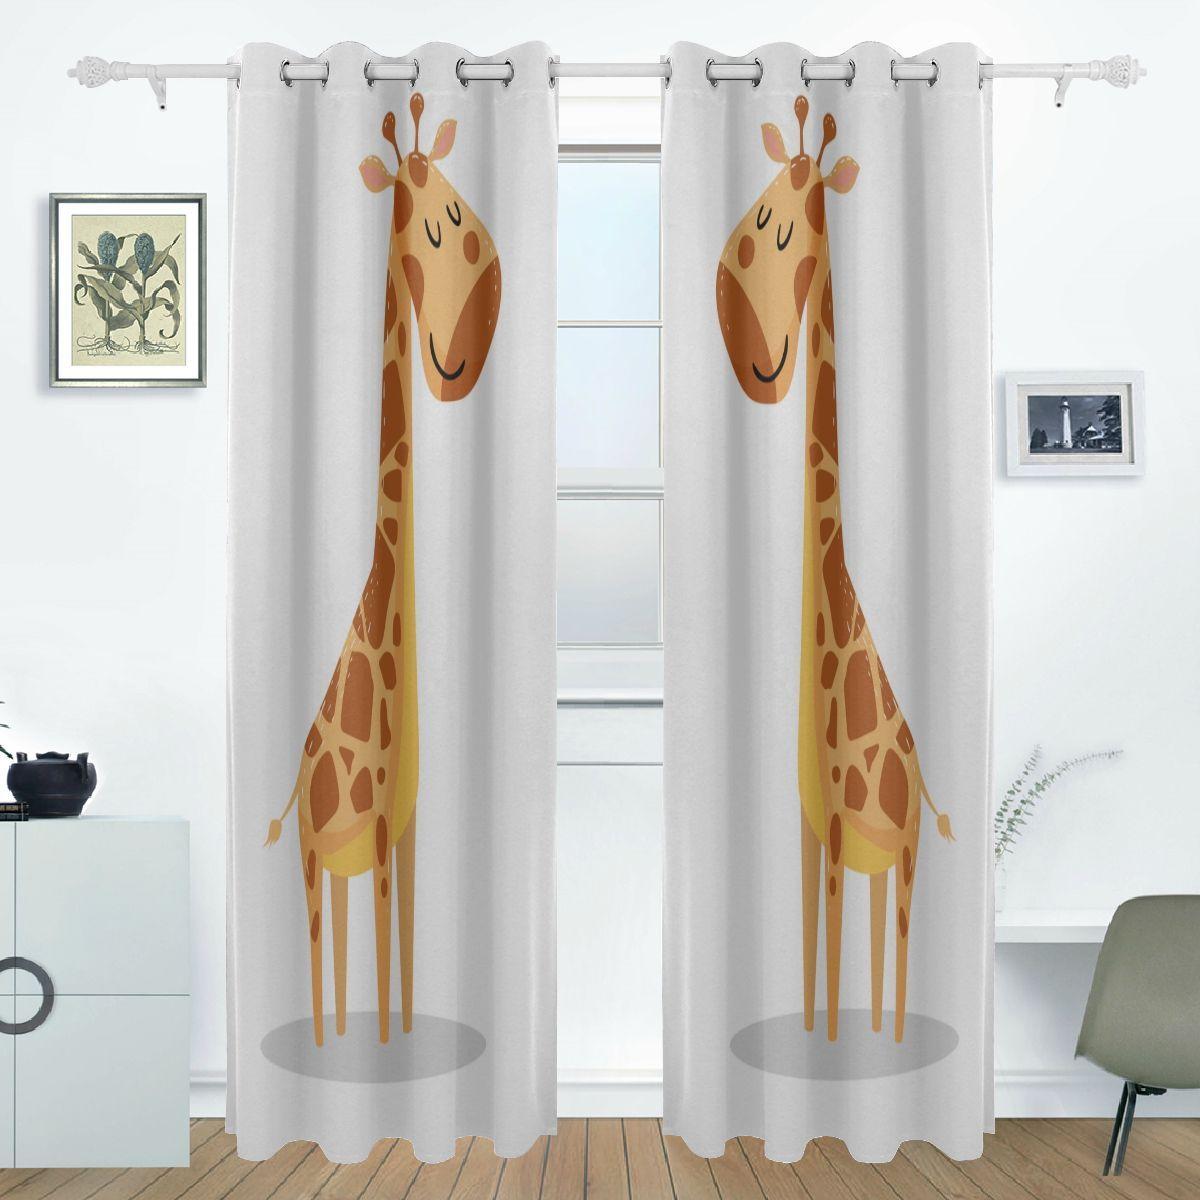 54 Inch Window Curtains Lovely Cute Outdoor Travel Giraffe